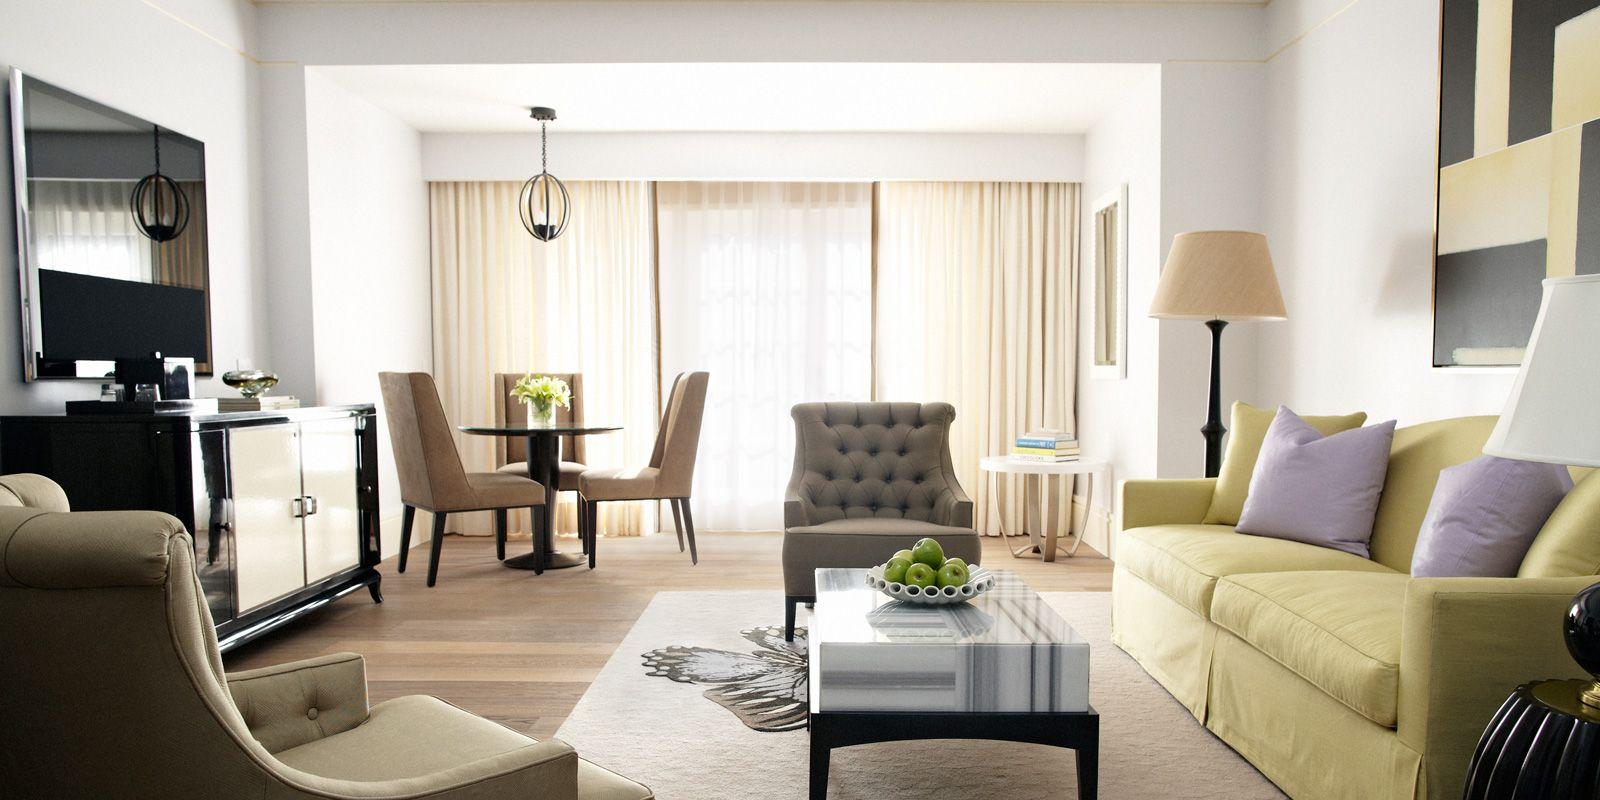 Rooms And Suites At Hotel Bel Air Hotel Bel Air Suite Room